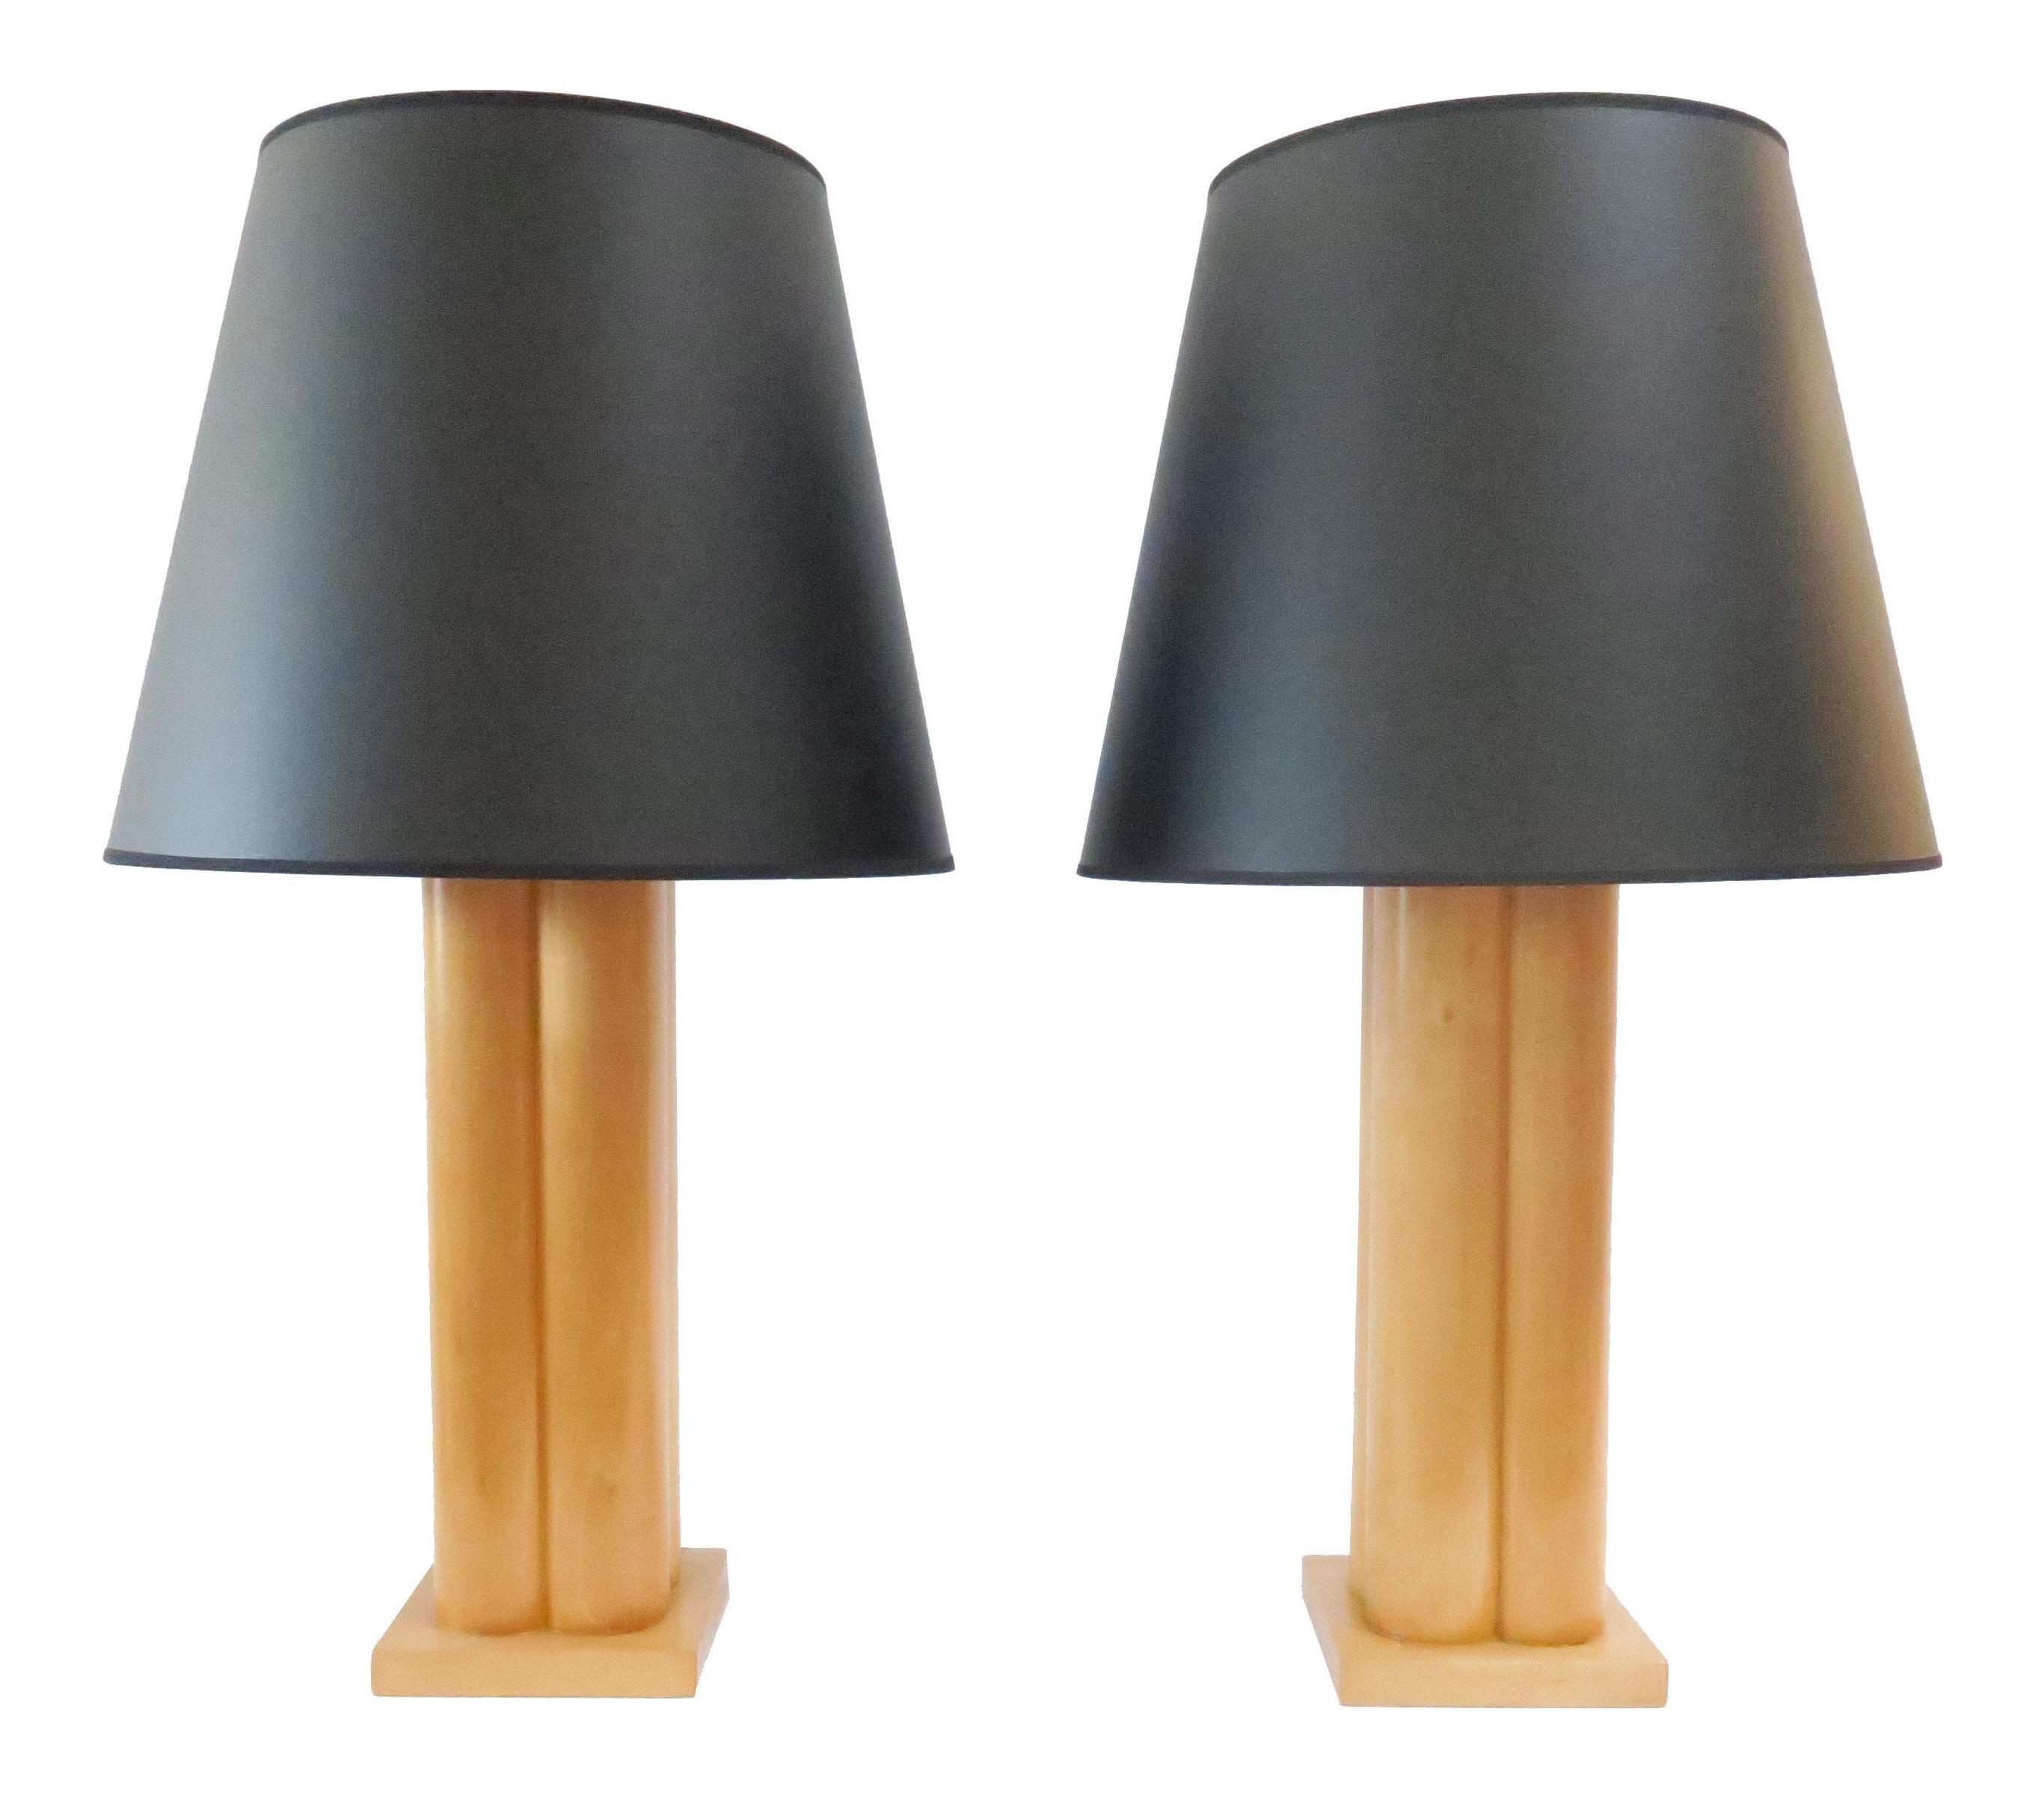 Vintage Wood Column Table Lamps A Pair